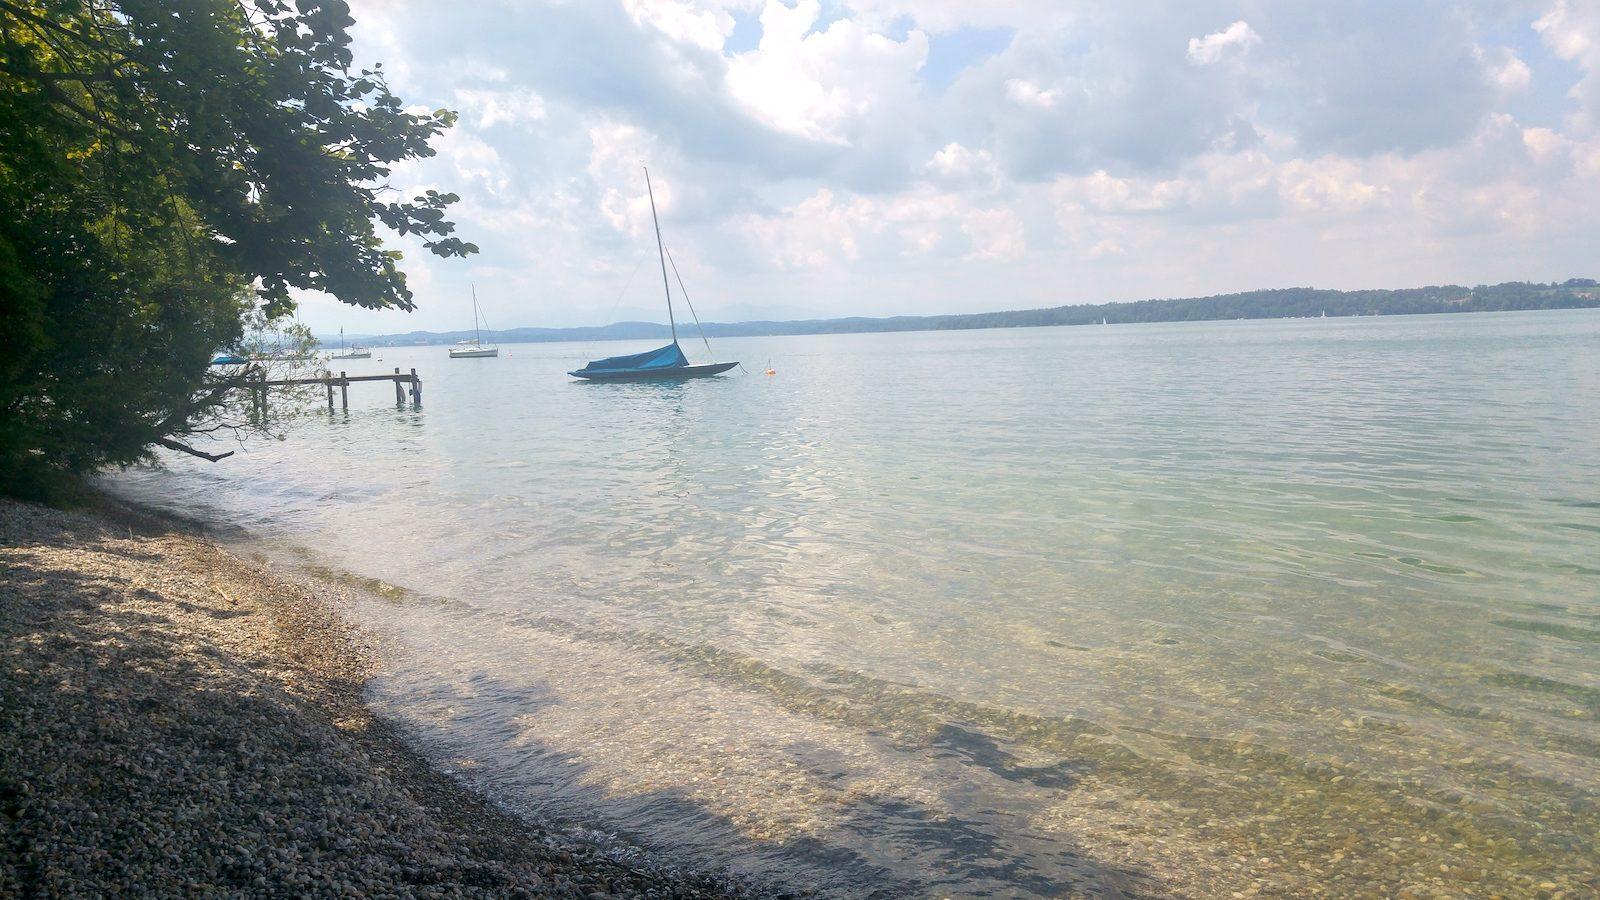 Ufer am Starnberger See